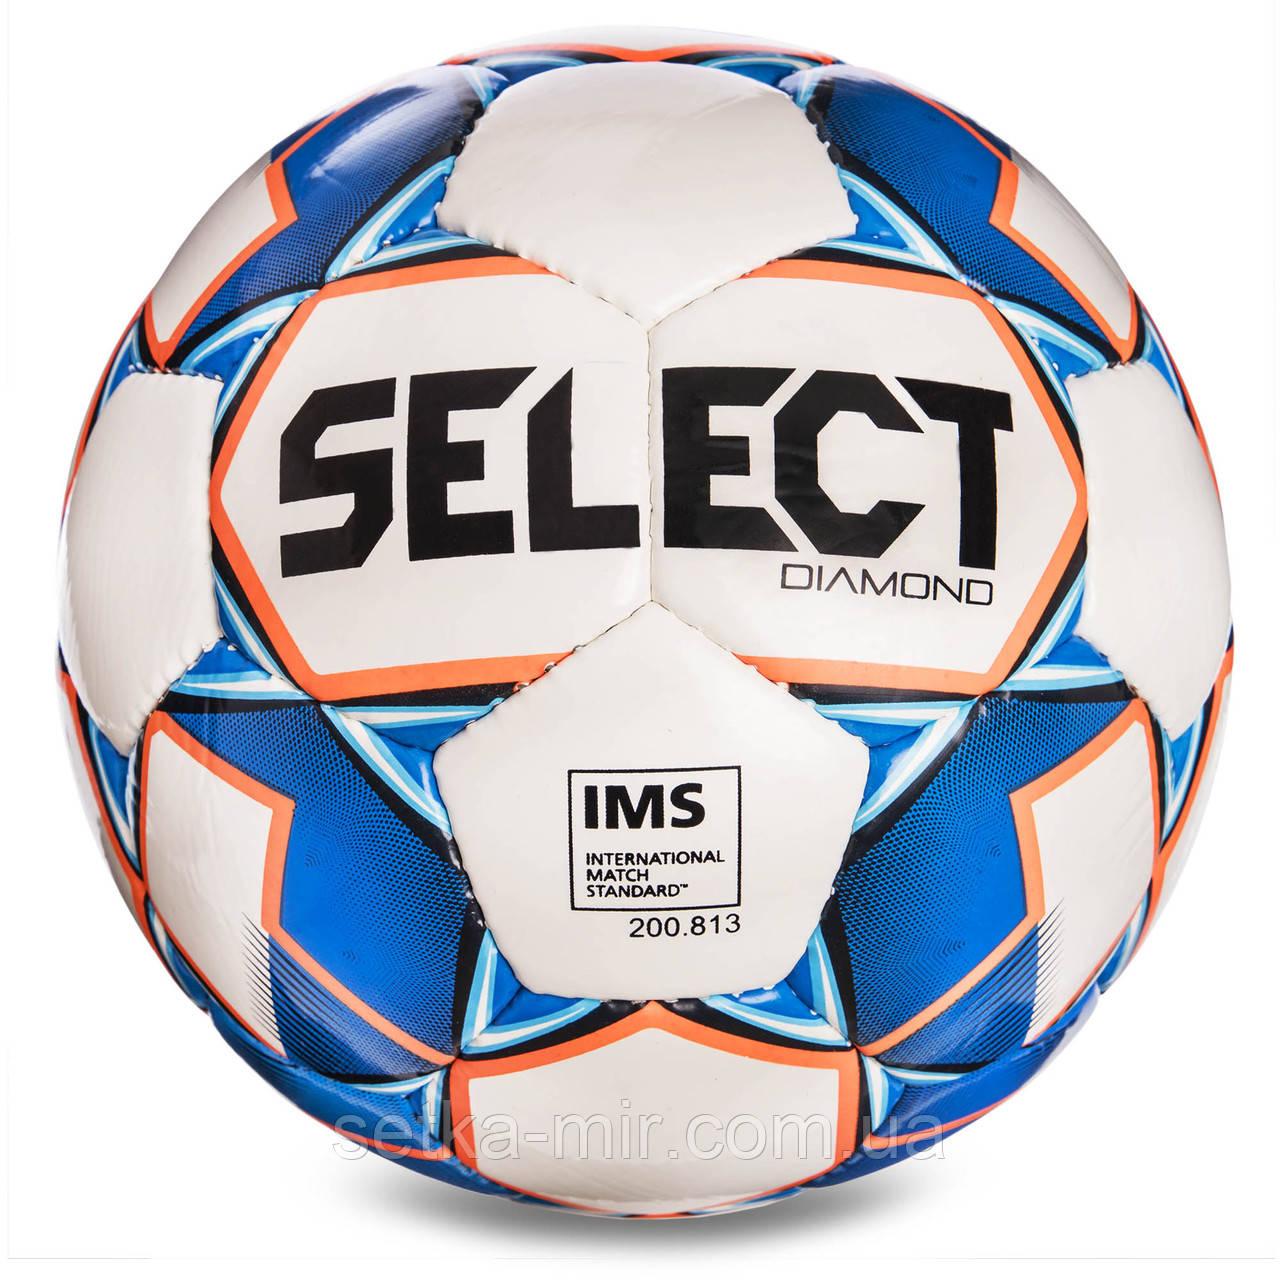 Мяч футбольный №5 SELECT DIAMOND IMS NEW (FFPUS 1200, белый-синий-оранжевый)